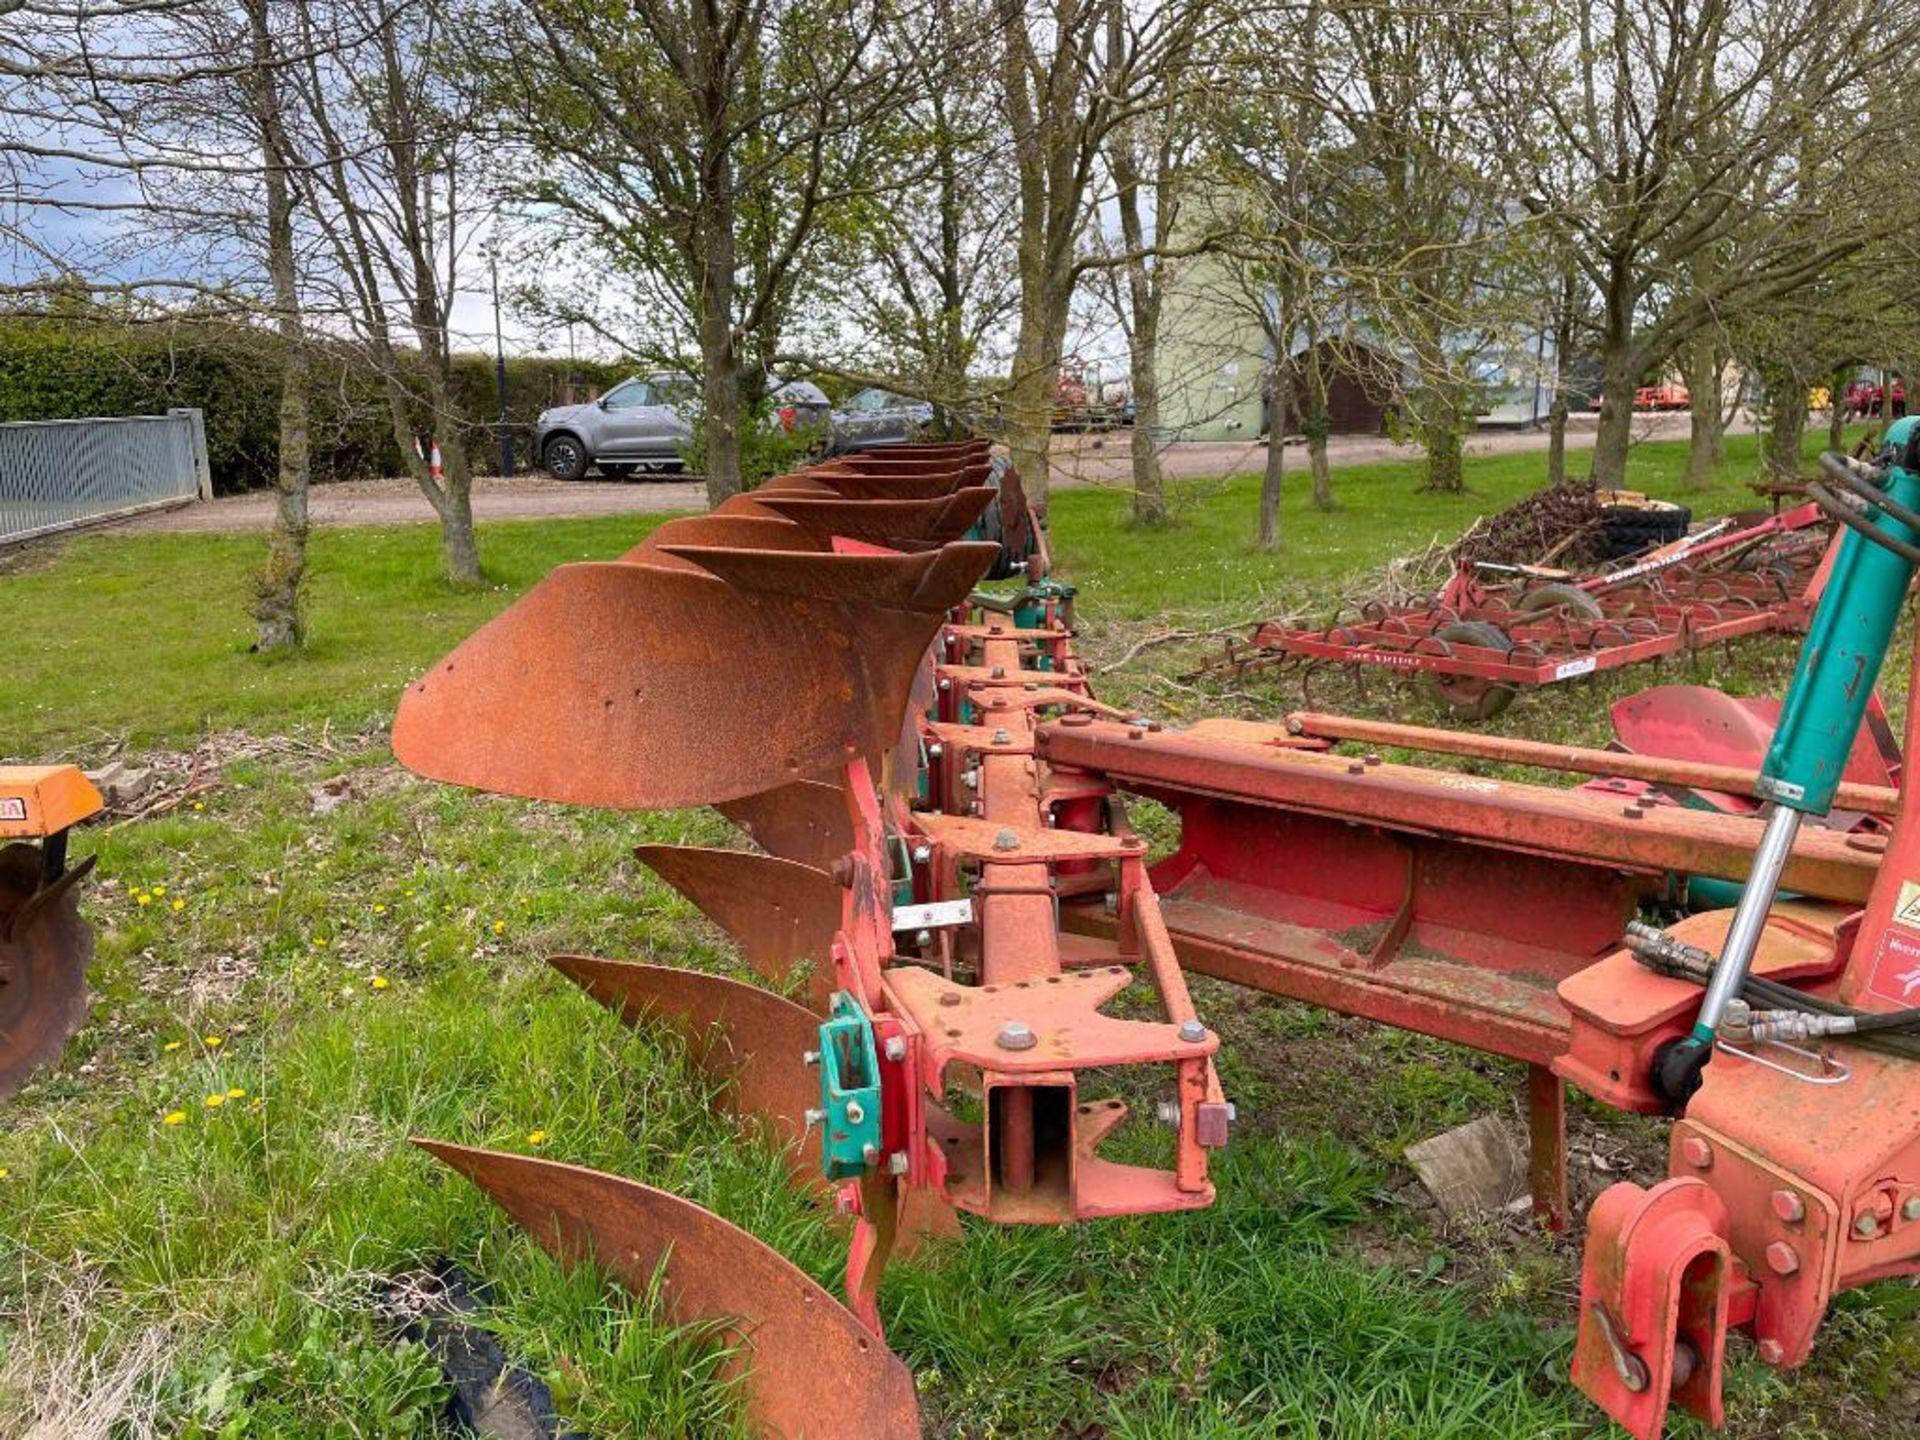 Kverneland 6+1f LO85 reversible plough, hydraulic vari-width. Model No: 85-300-28. Serial No: 240. N - Image 10 of 11